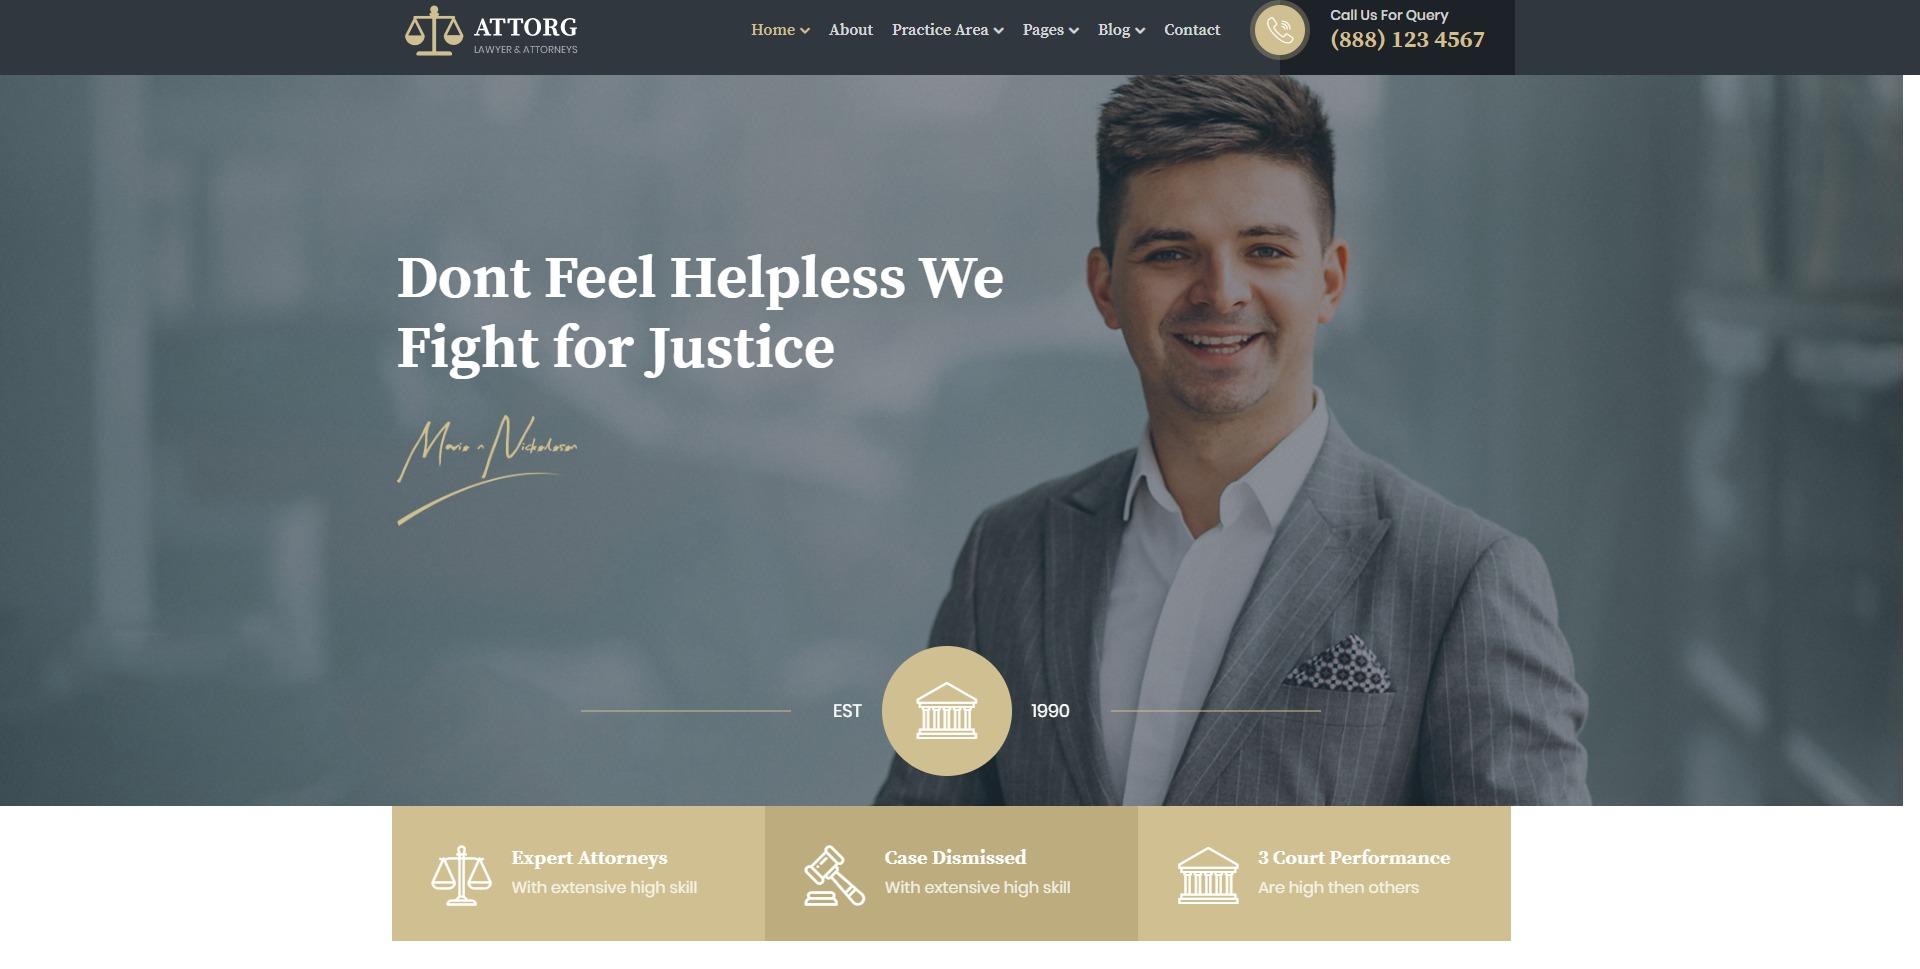 Attorg - 法律律师事务所网站WordPress主题